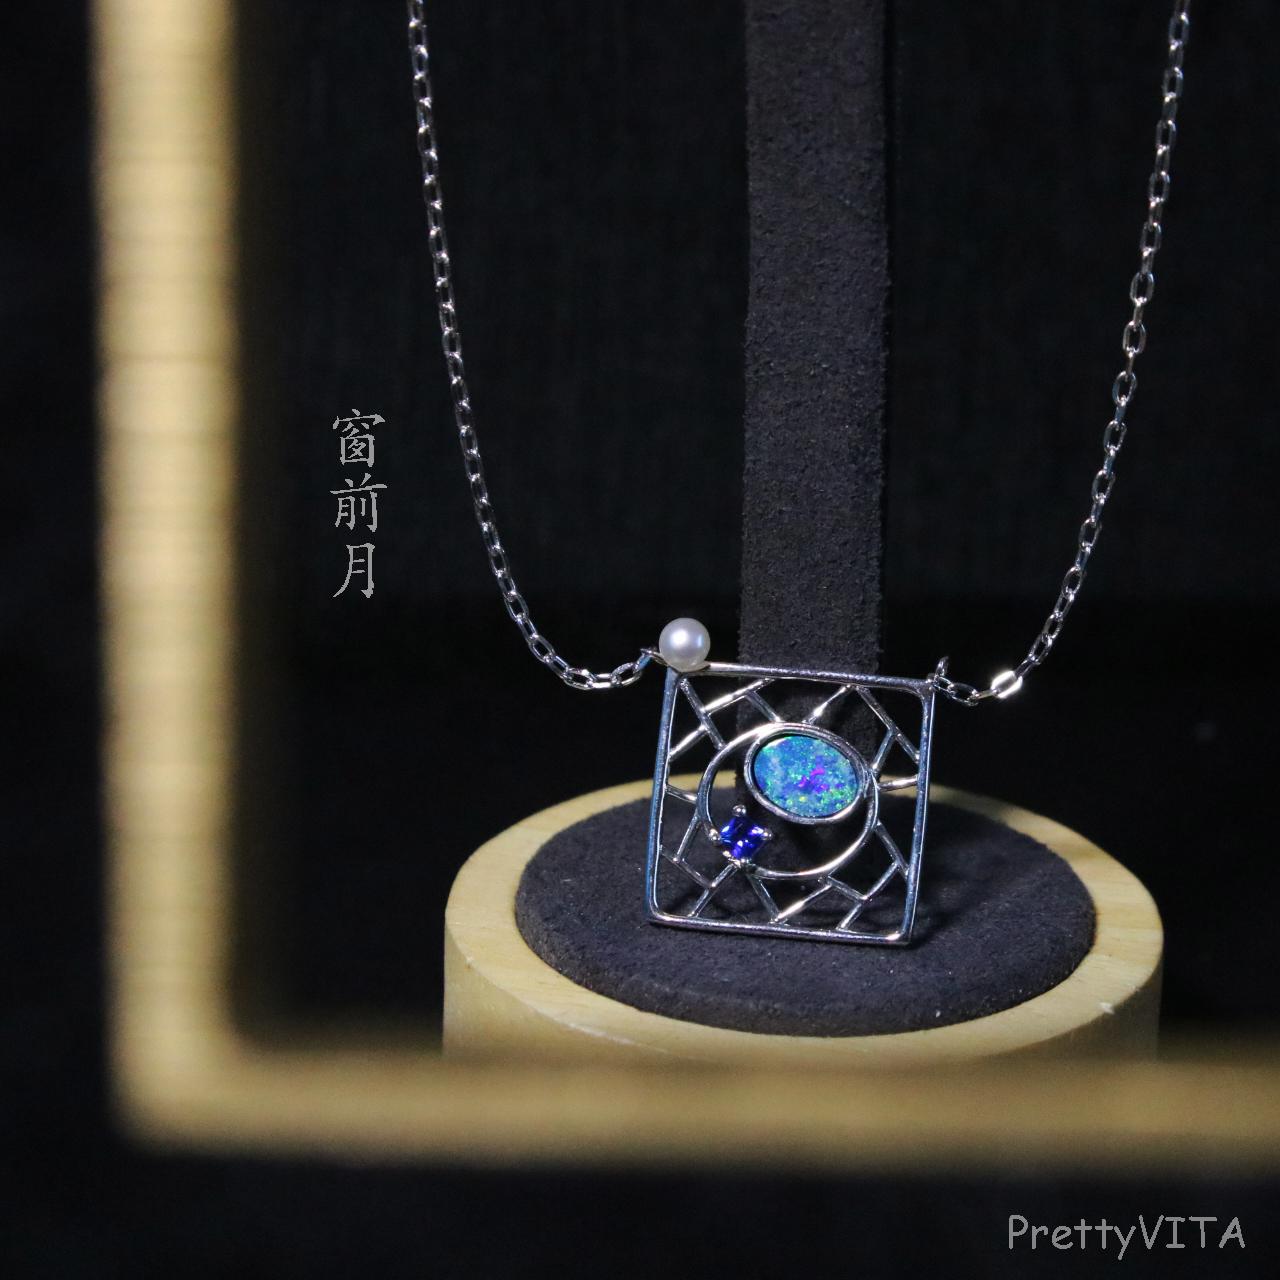 Necklaces women design feeling Pure Silver Freshwater Pearl opal two-layer stone pink green tourmaline window Jiangnan moon